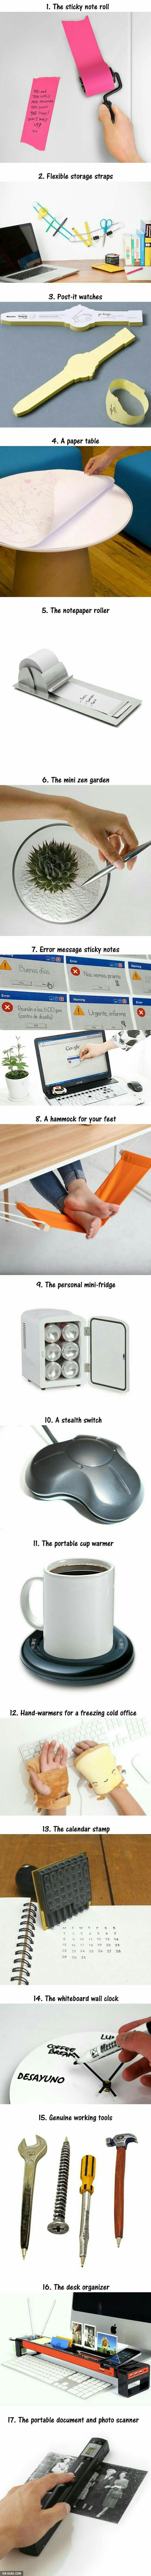 45 best Ідеї для дому images on Pinterest | Cool things, Creativity ...